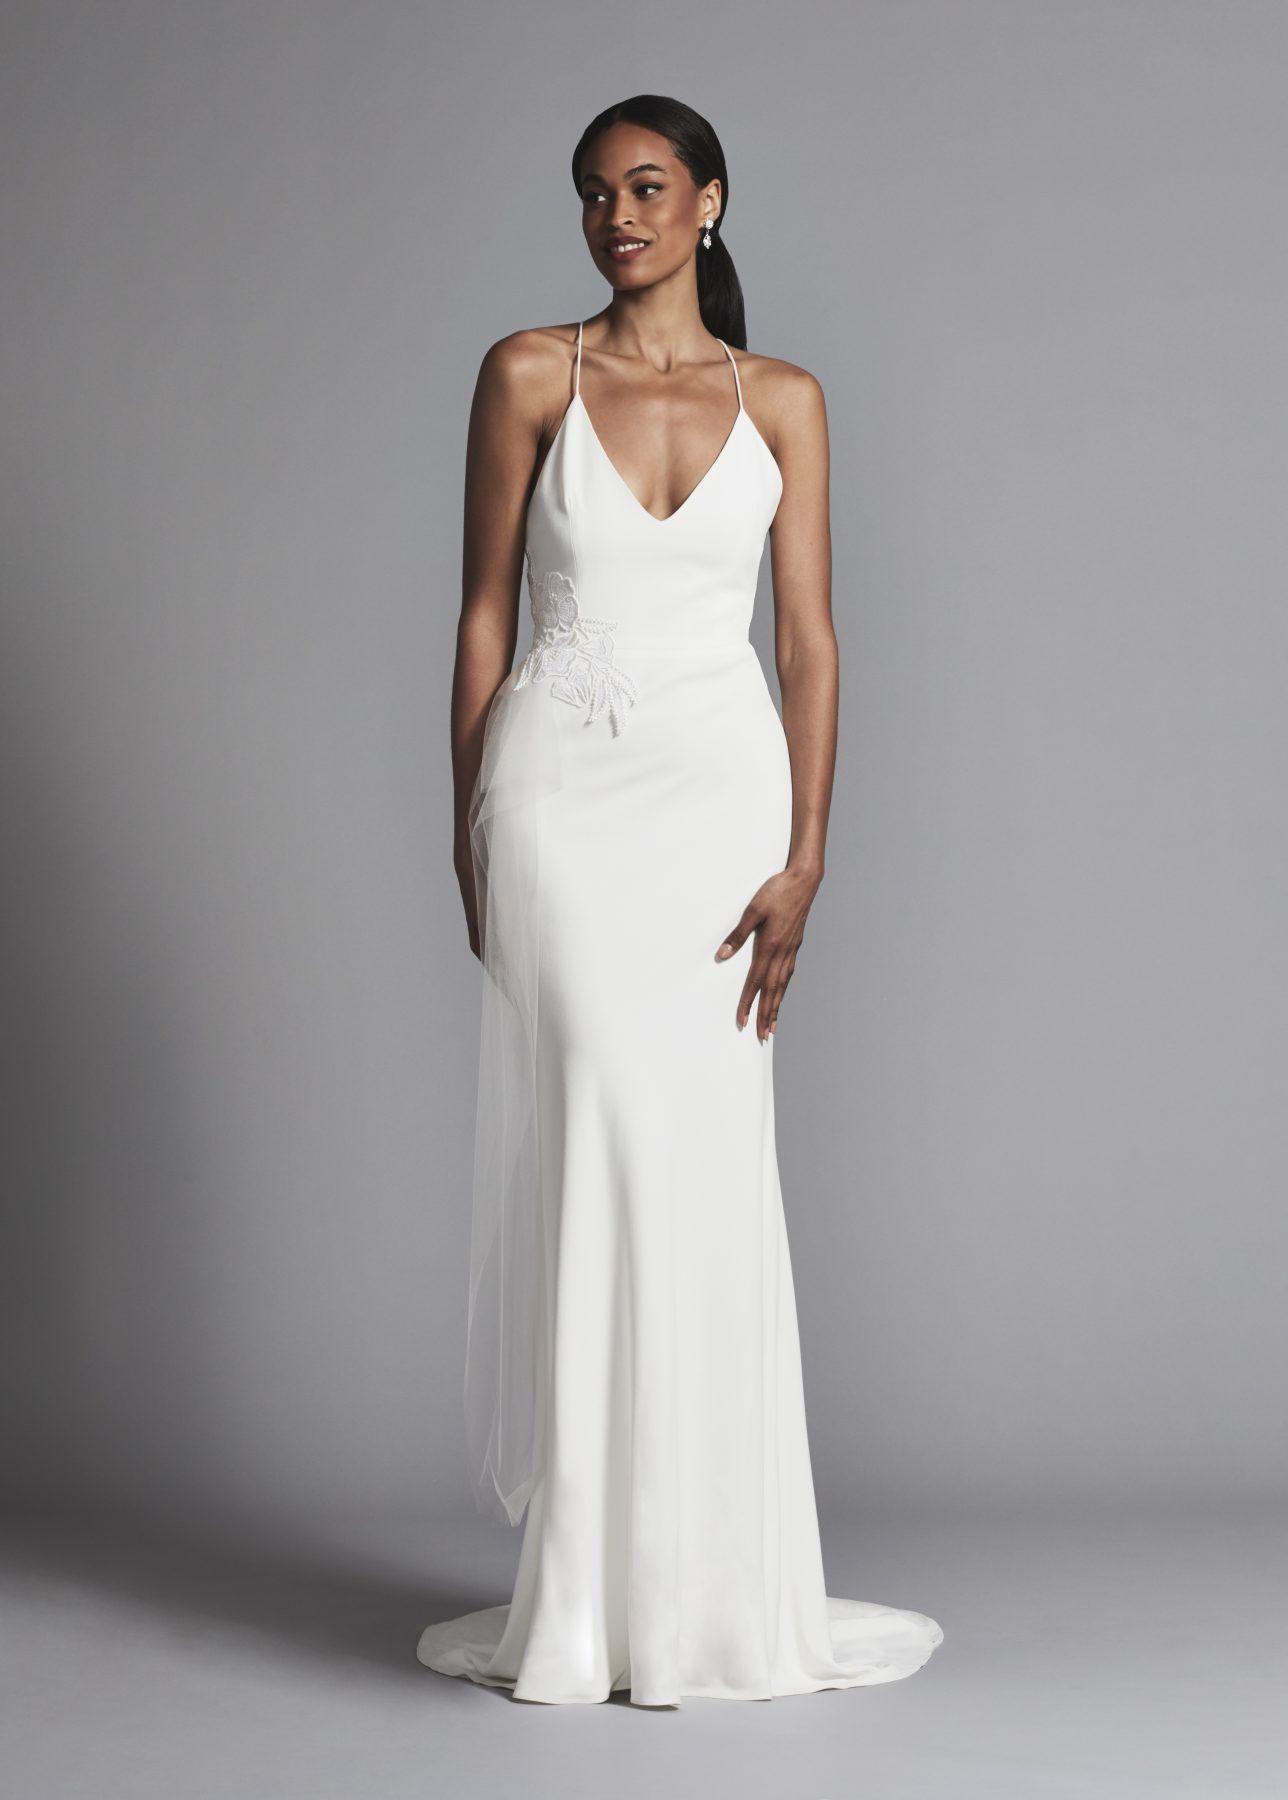 Simple Sheath Spaghetti Strap Crepe Wedding Dress With V Neckline